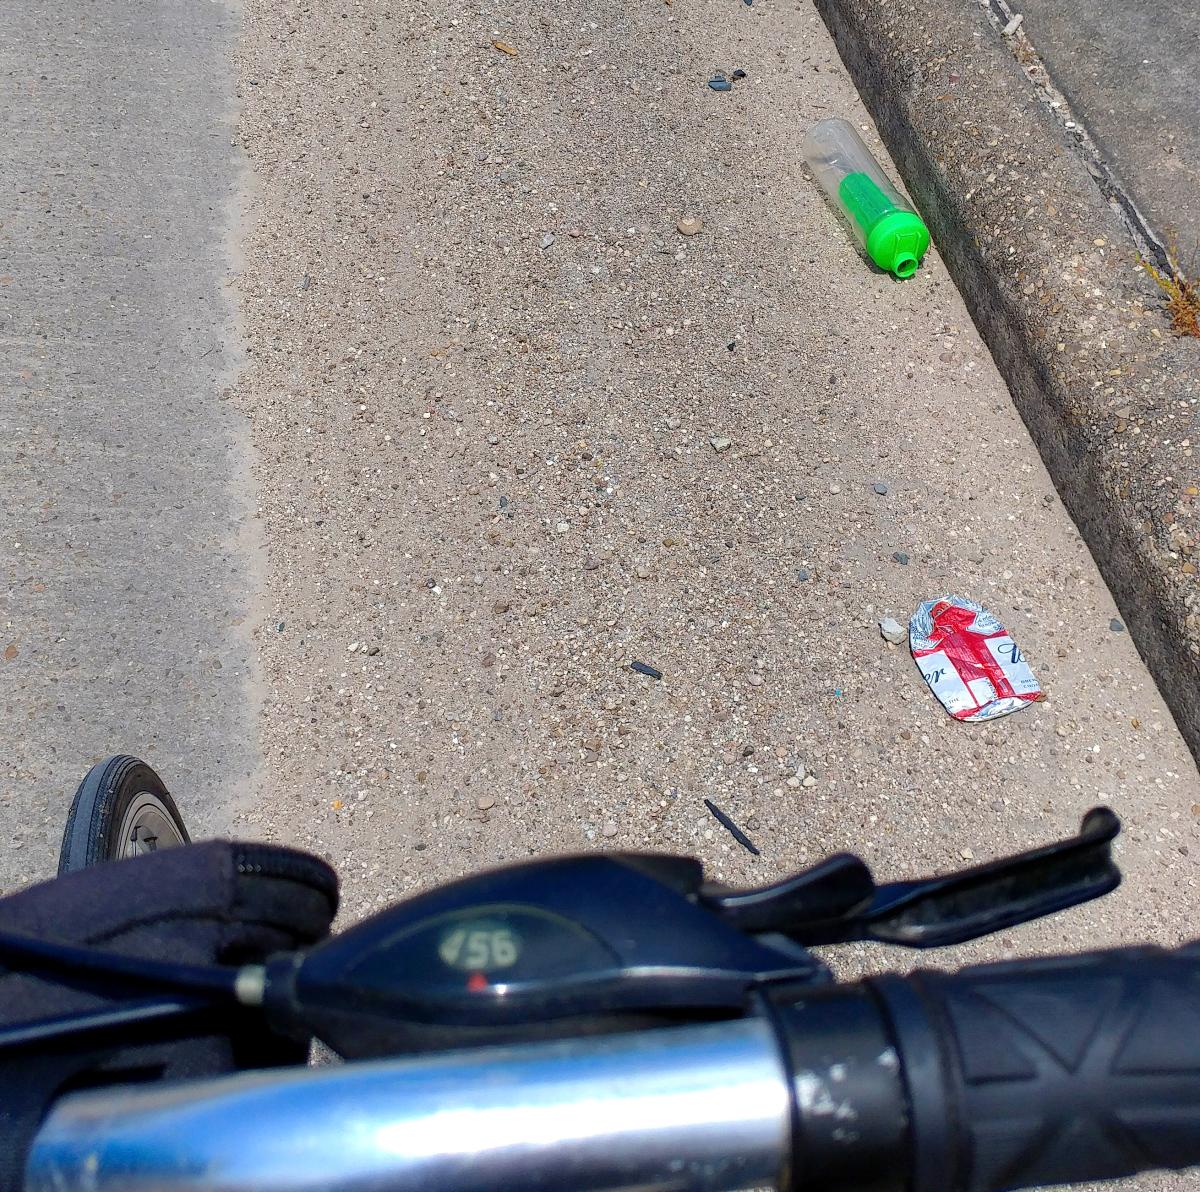 Houston, Ken Hoffman, pethouse pet of the week, westpark bike lanes